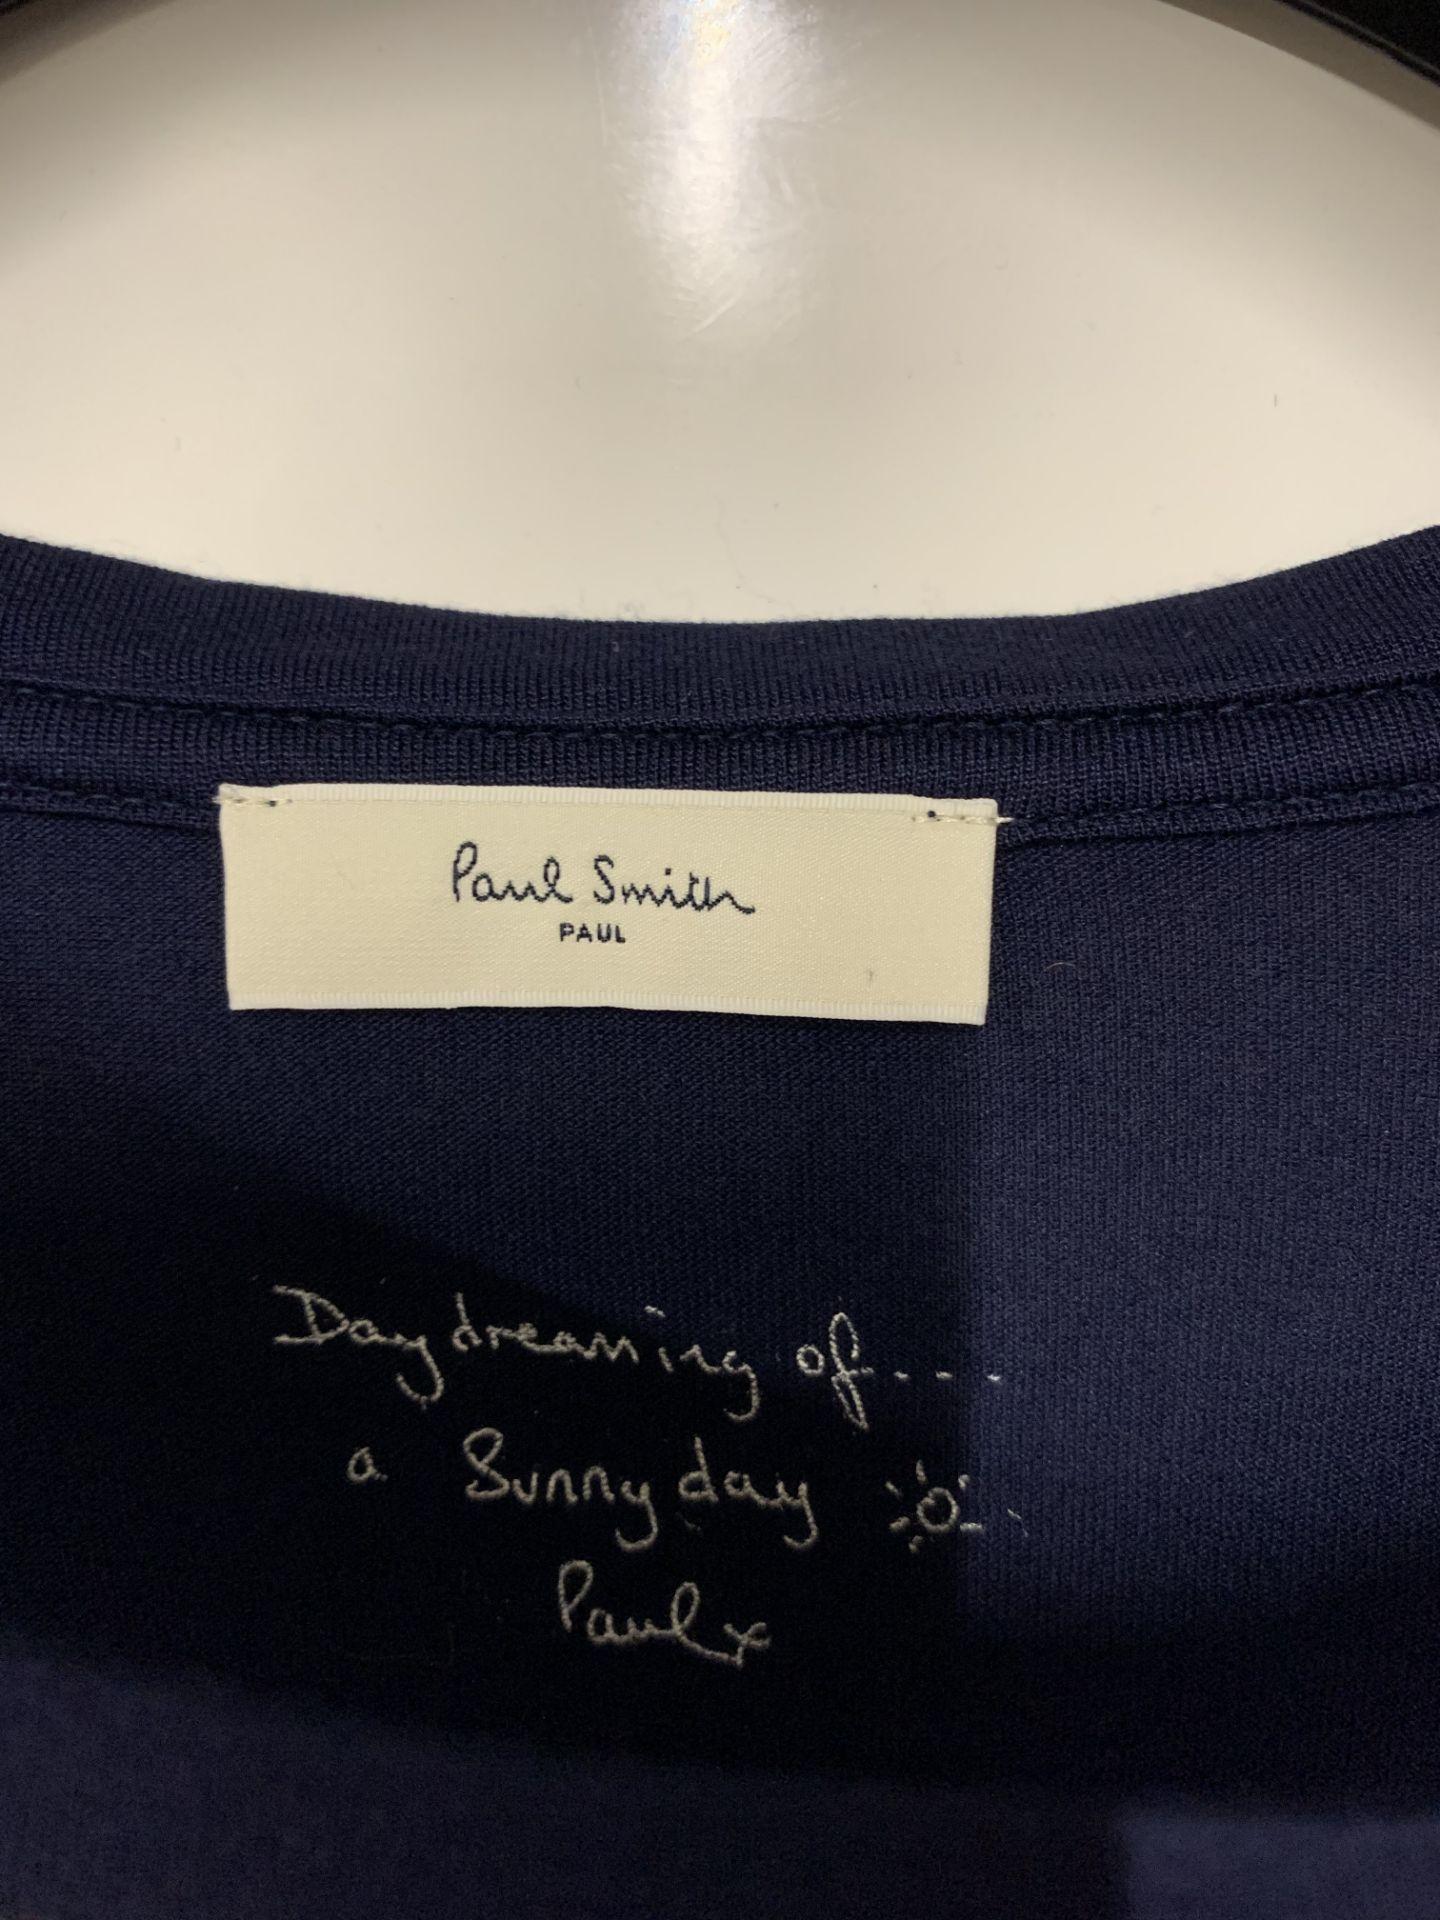 Lot 33 - Paul by Paul Smith Women's Printed Poppy T-Shirt - Black/Multi